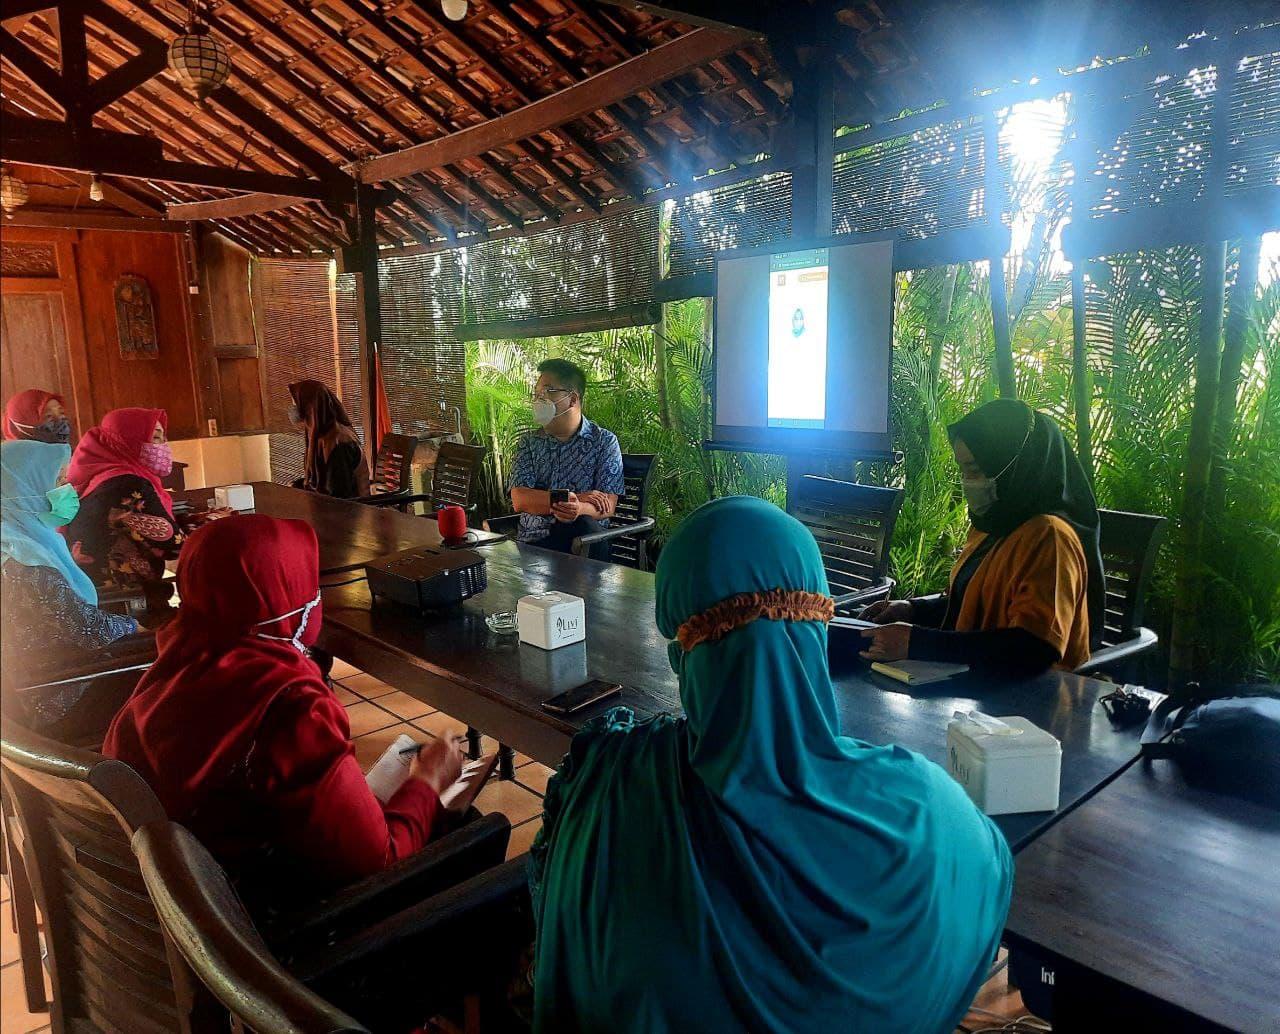 Sosialisasi ICANDO di Kota Blitar yang dihadiri oleh IGTKM dan IGRA dalam rangka mendidik guru-guru cerdik menghadapi digitalisasi